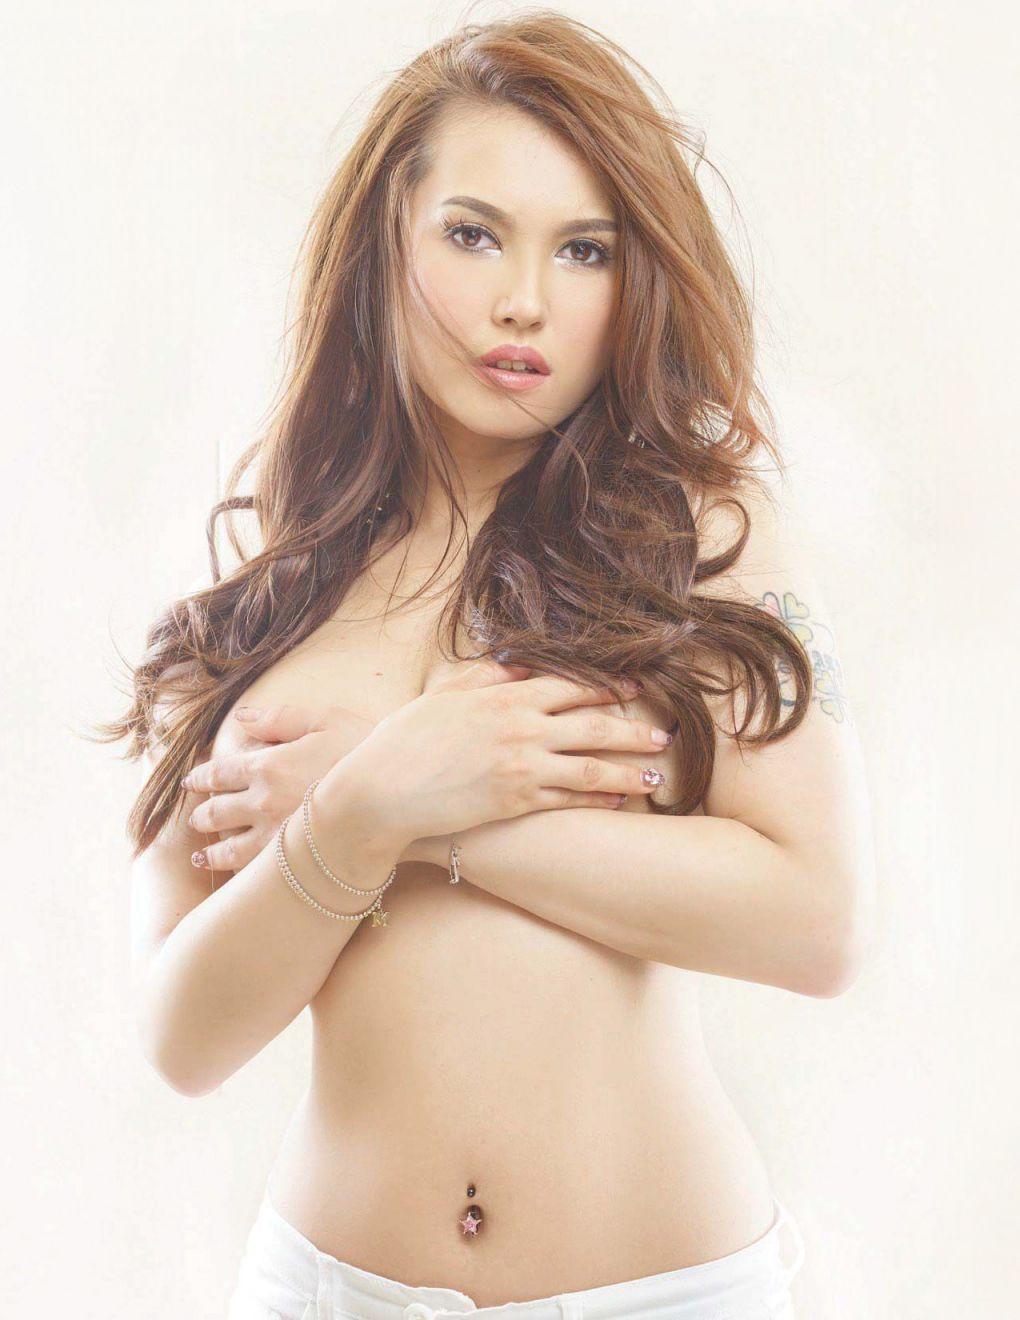 arab porn girls nude